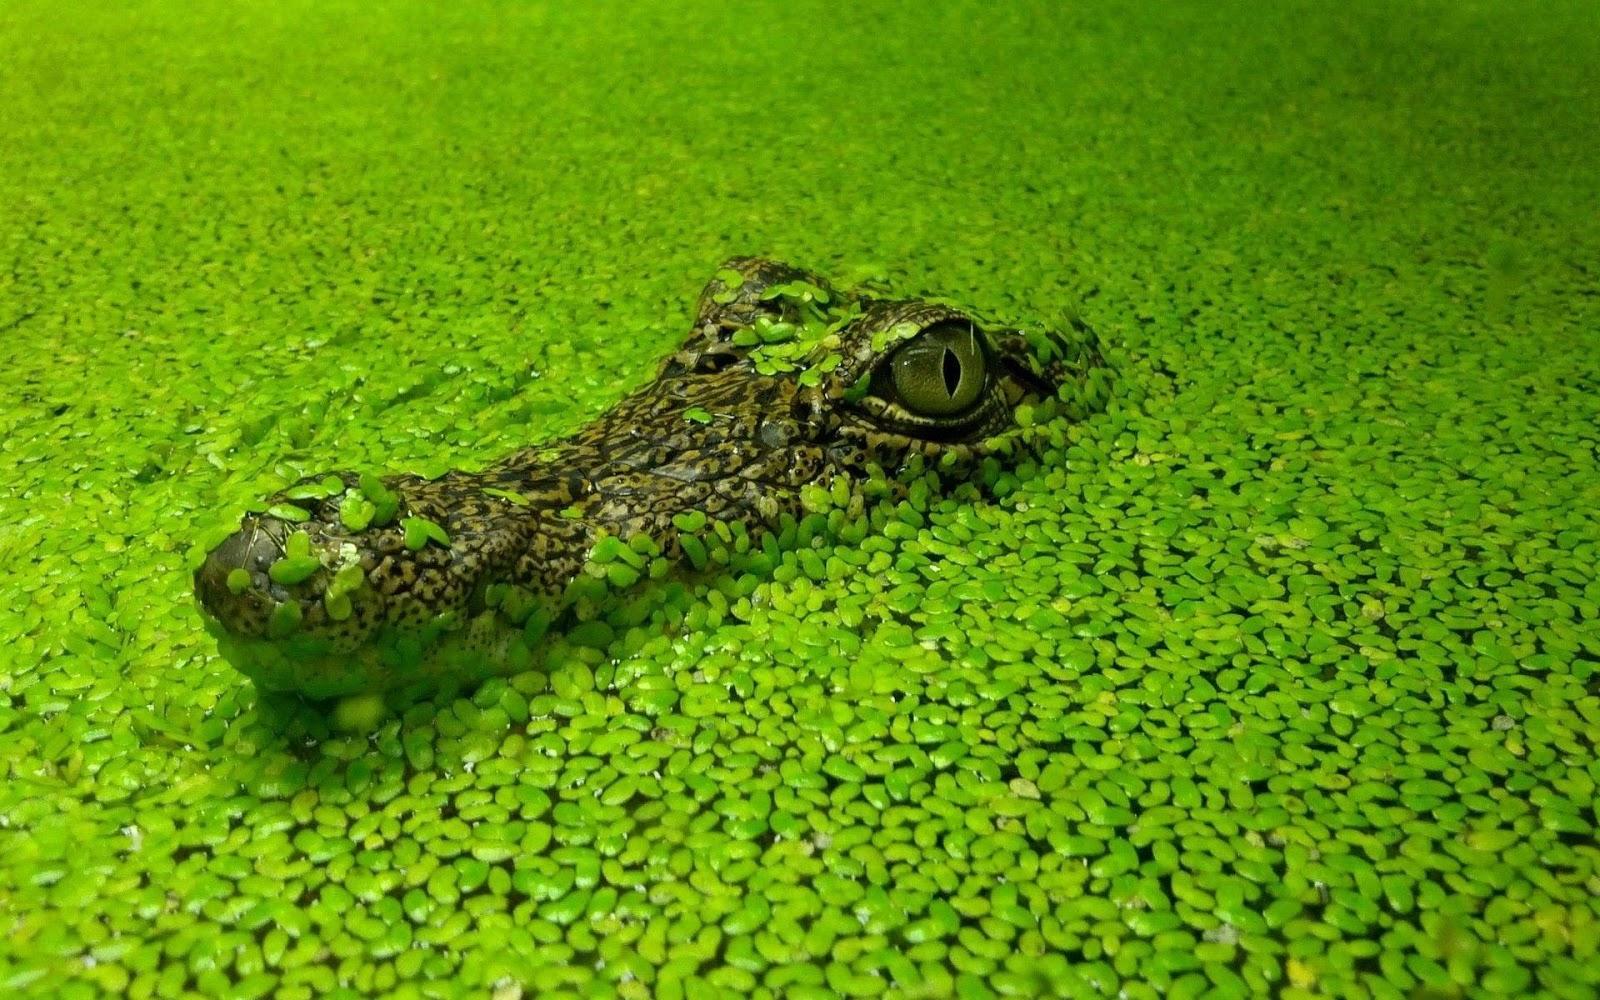 Alligator Wallpapers  1920x1200